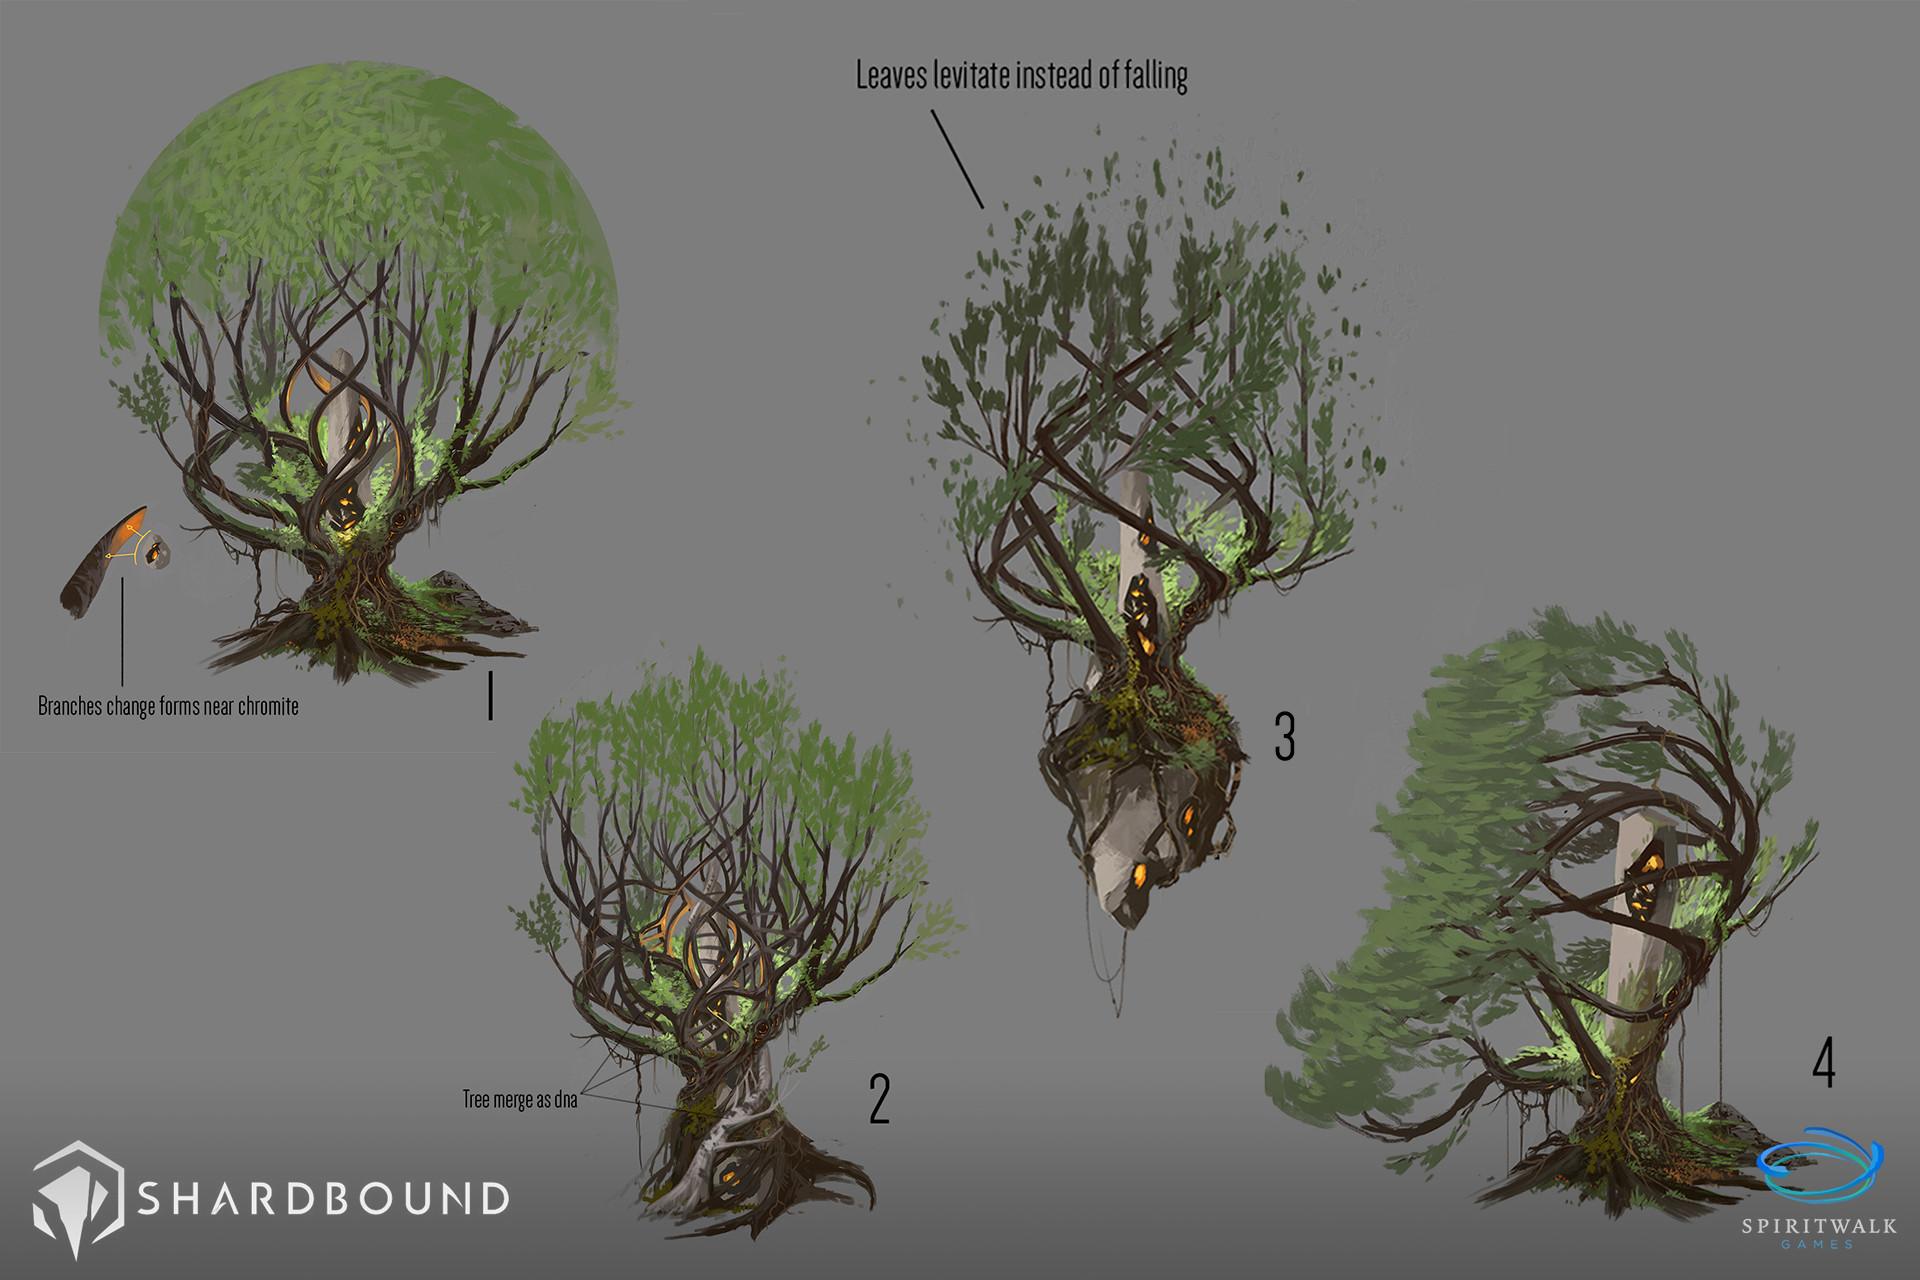 David alvarez dalvarez shardbound treesfusion 03